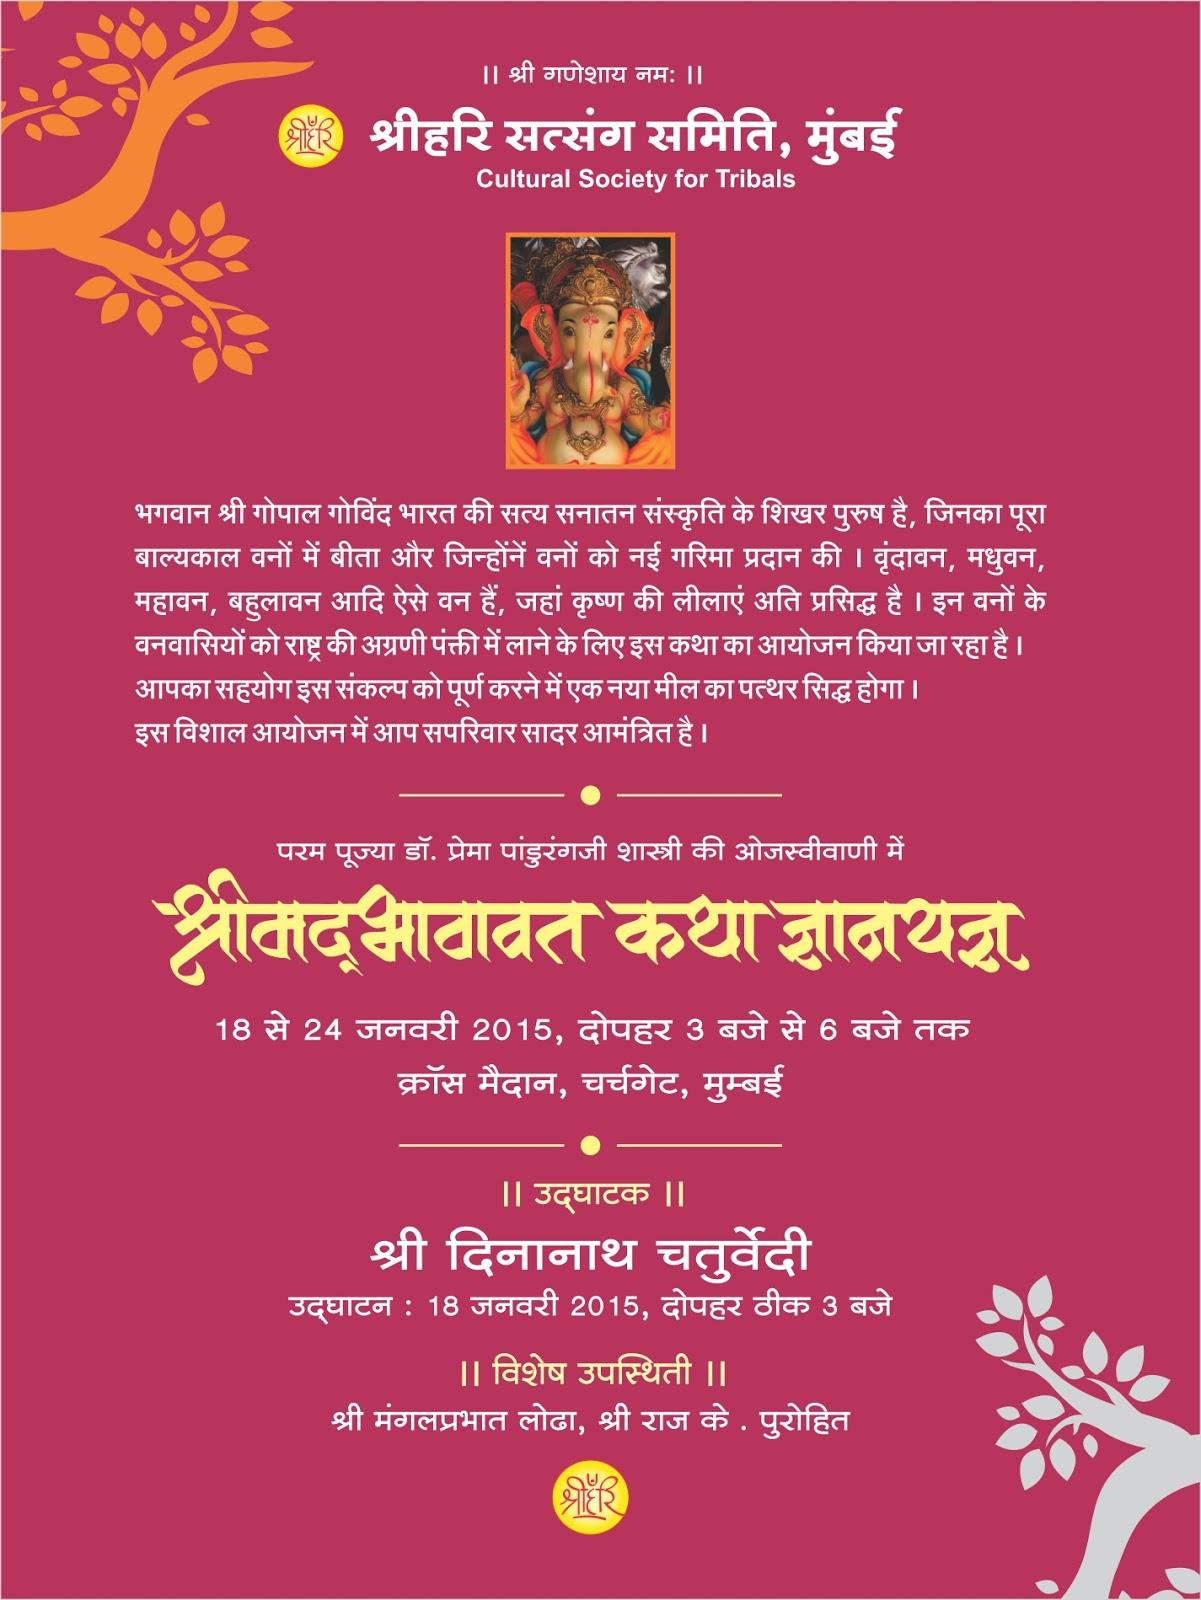 Shrimad bhagwat katha invitation card bhagwat katha invitation card design bhagwat katha card design bhagwat saptah invitation card invitation cards for stopboris Images